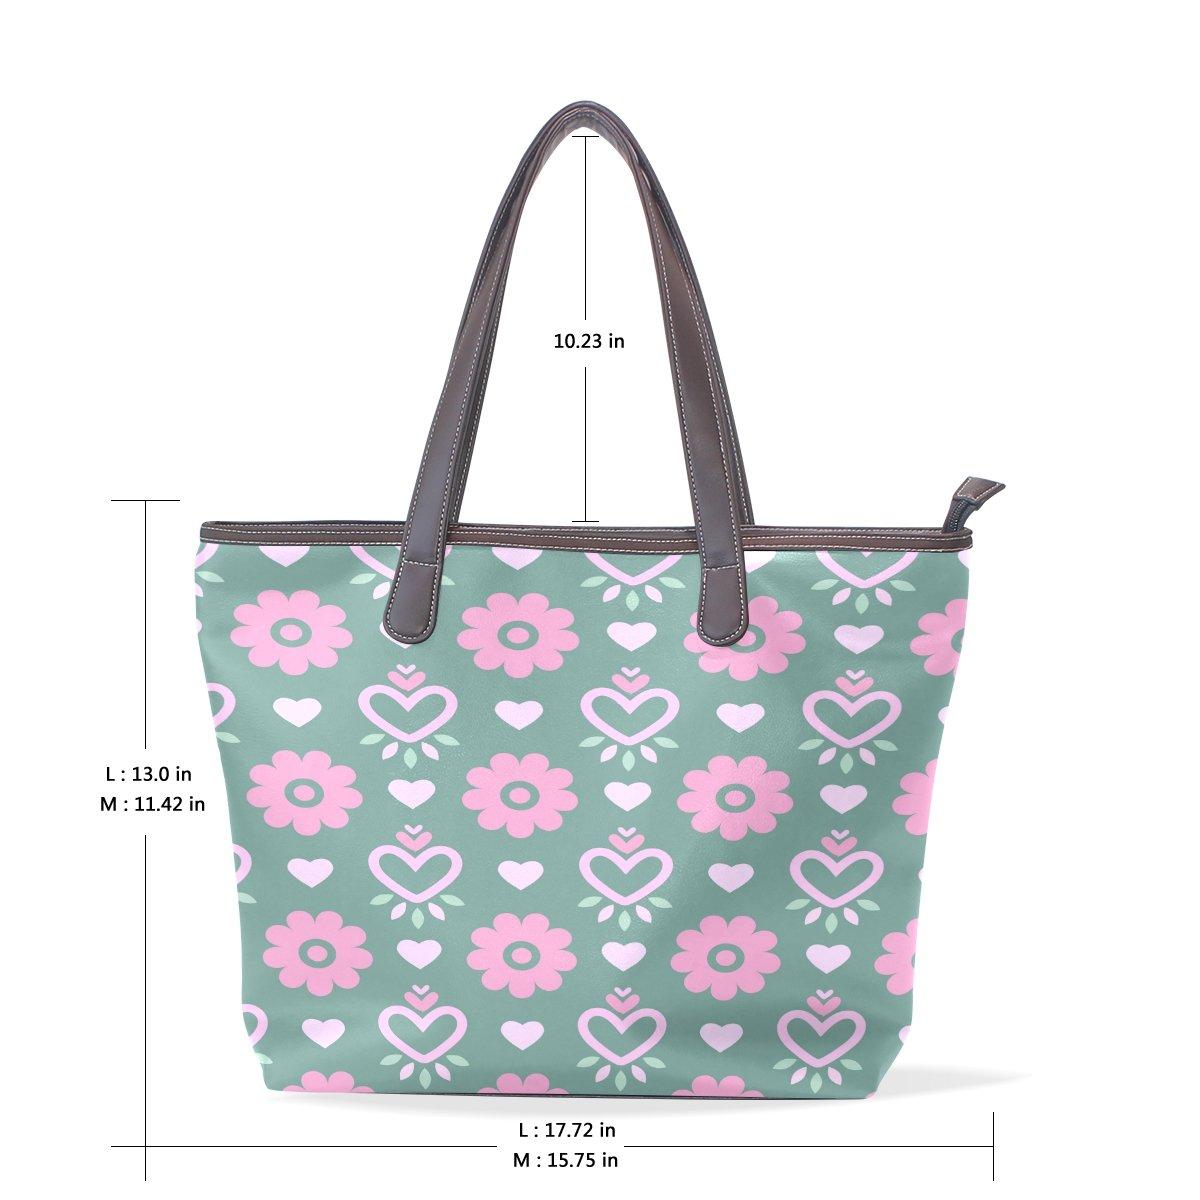 SCDS Cute Heart Plum Flower Pattern PU Leather Lady Handbag Tote Bag Zipper Shoulder Bag